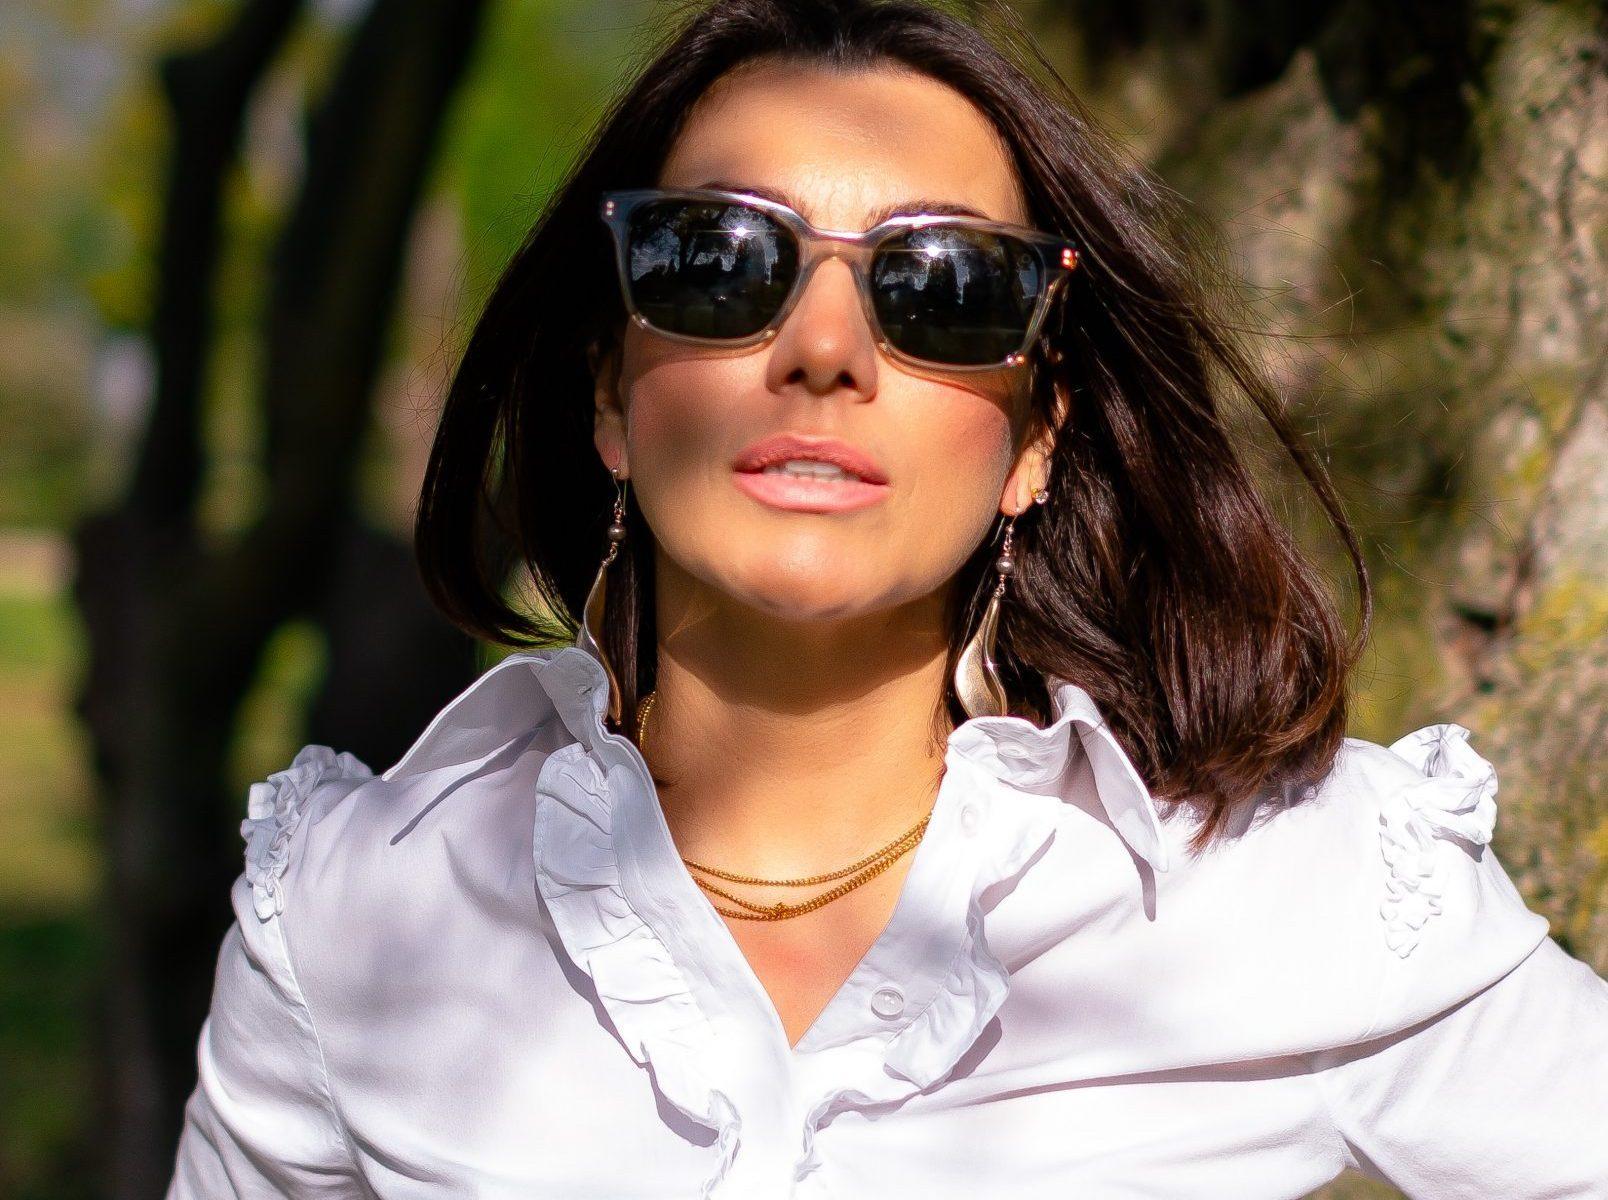 Vera Gallardo wearing white classic shirt with sunglasses in a garden next to a tree